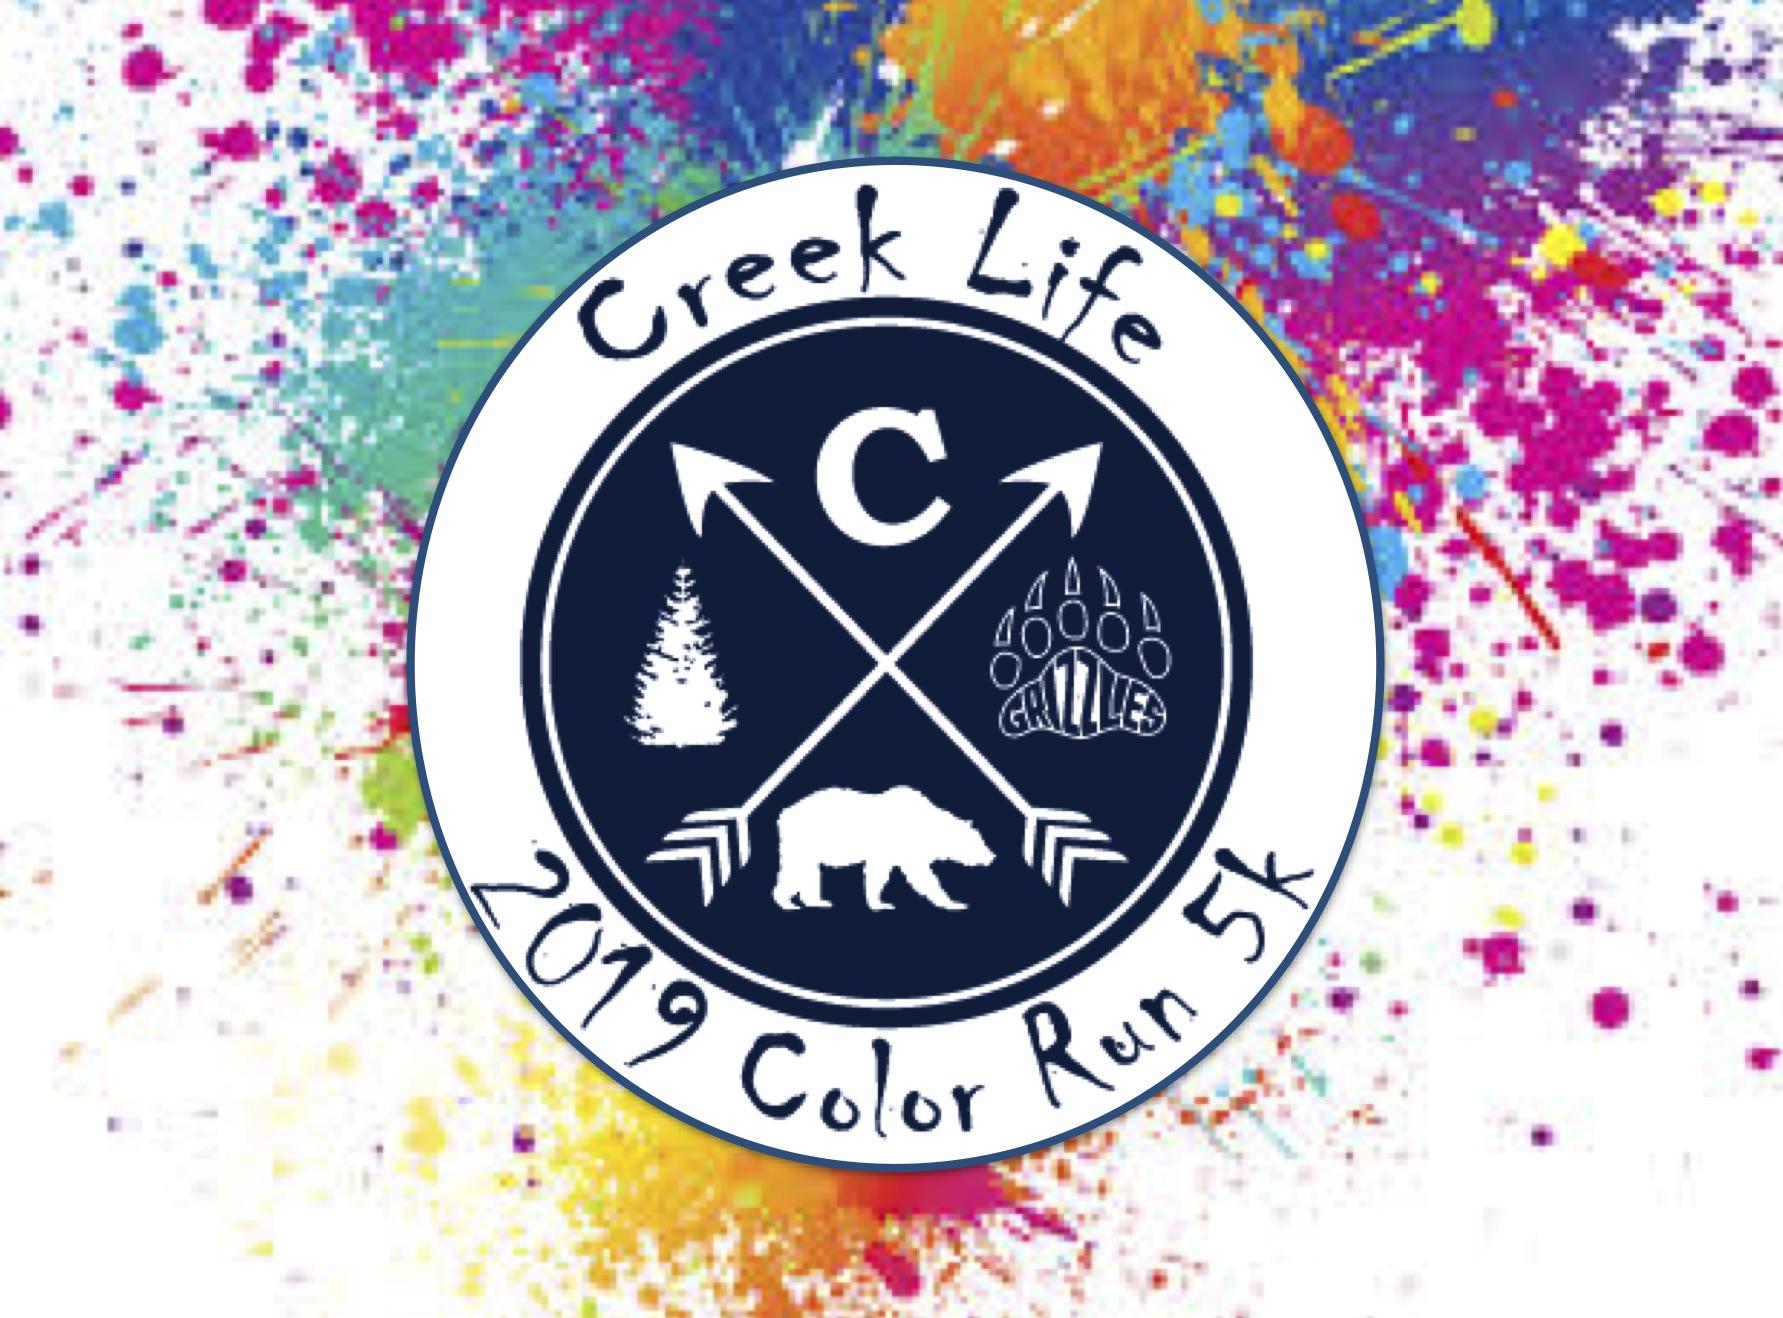 Creeklife 5K Color Run at Creekland Middle School.